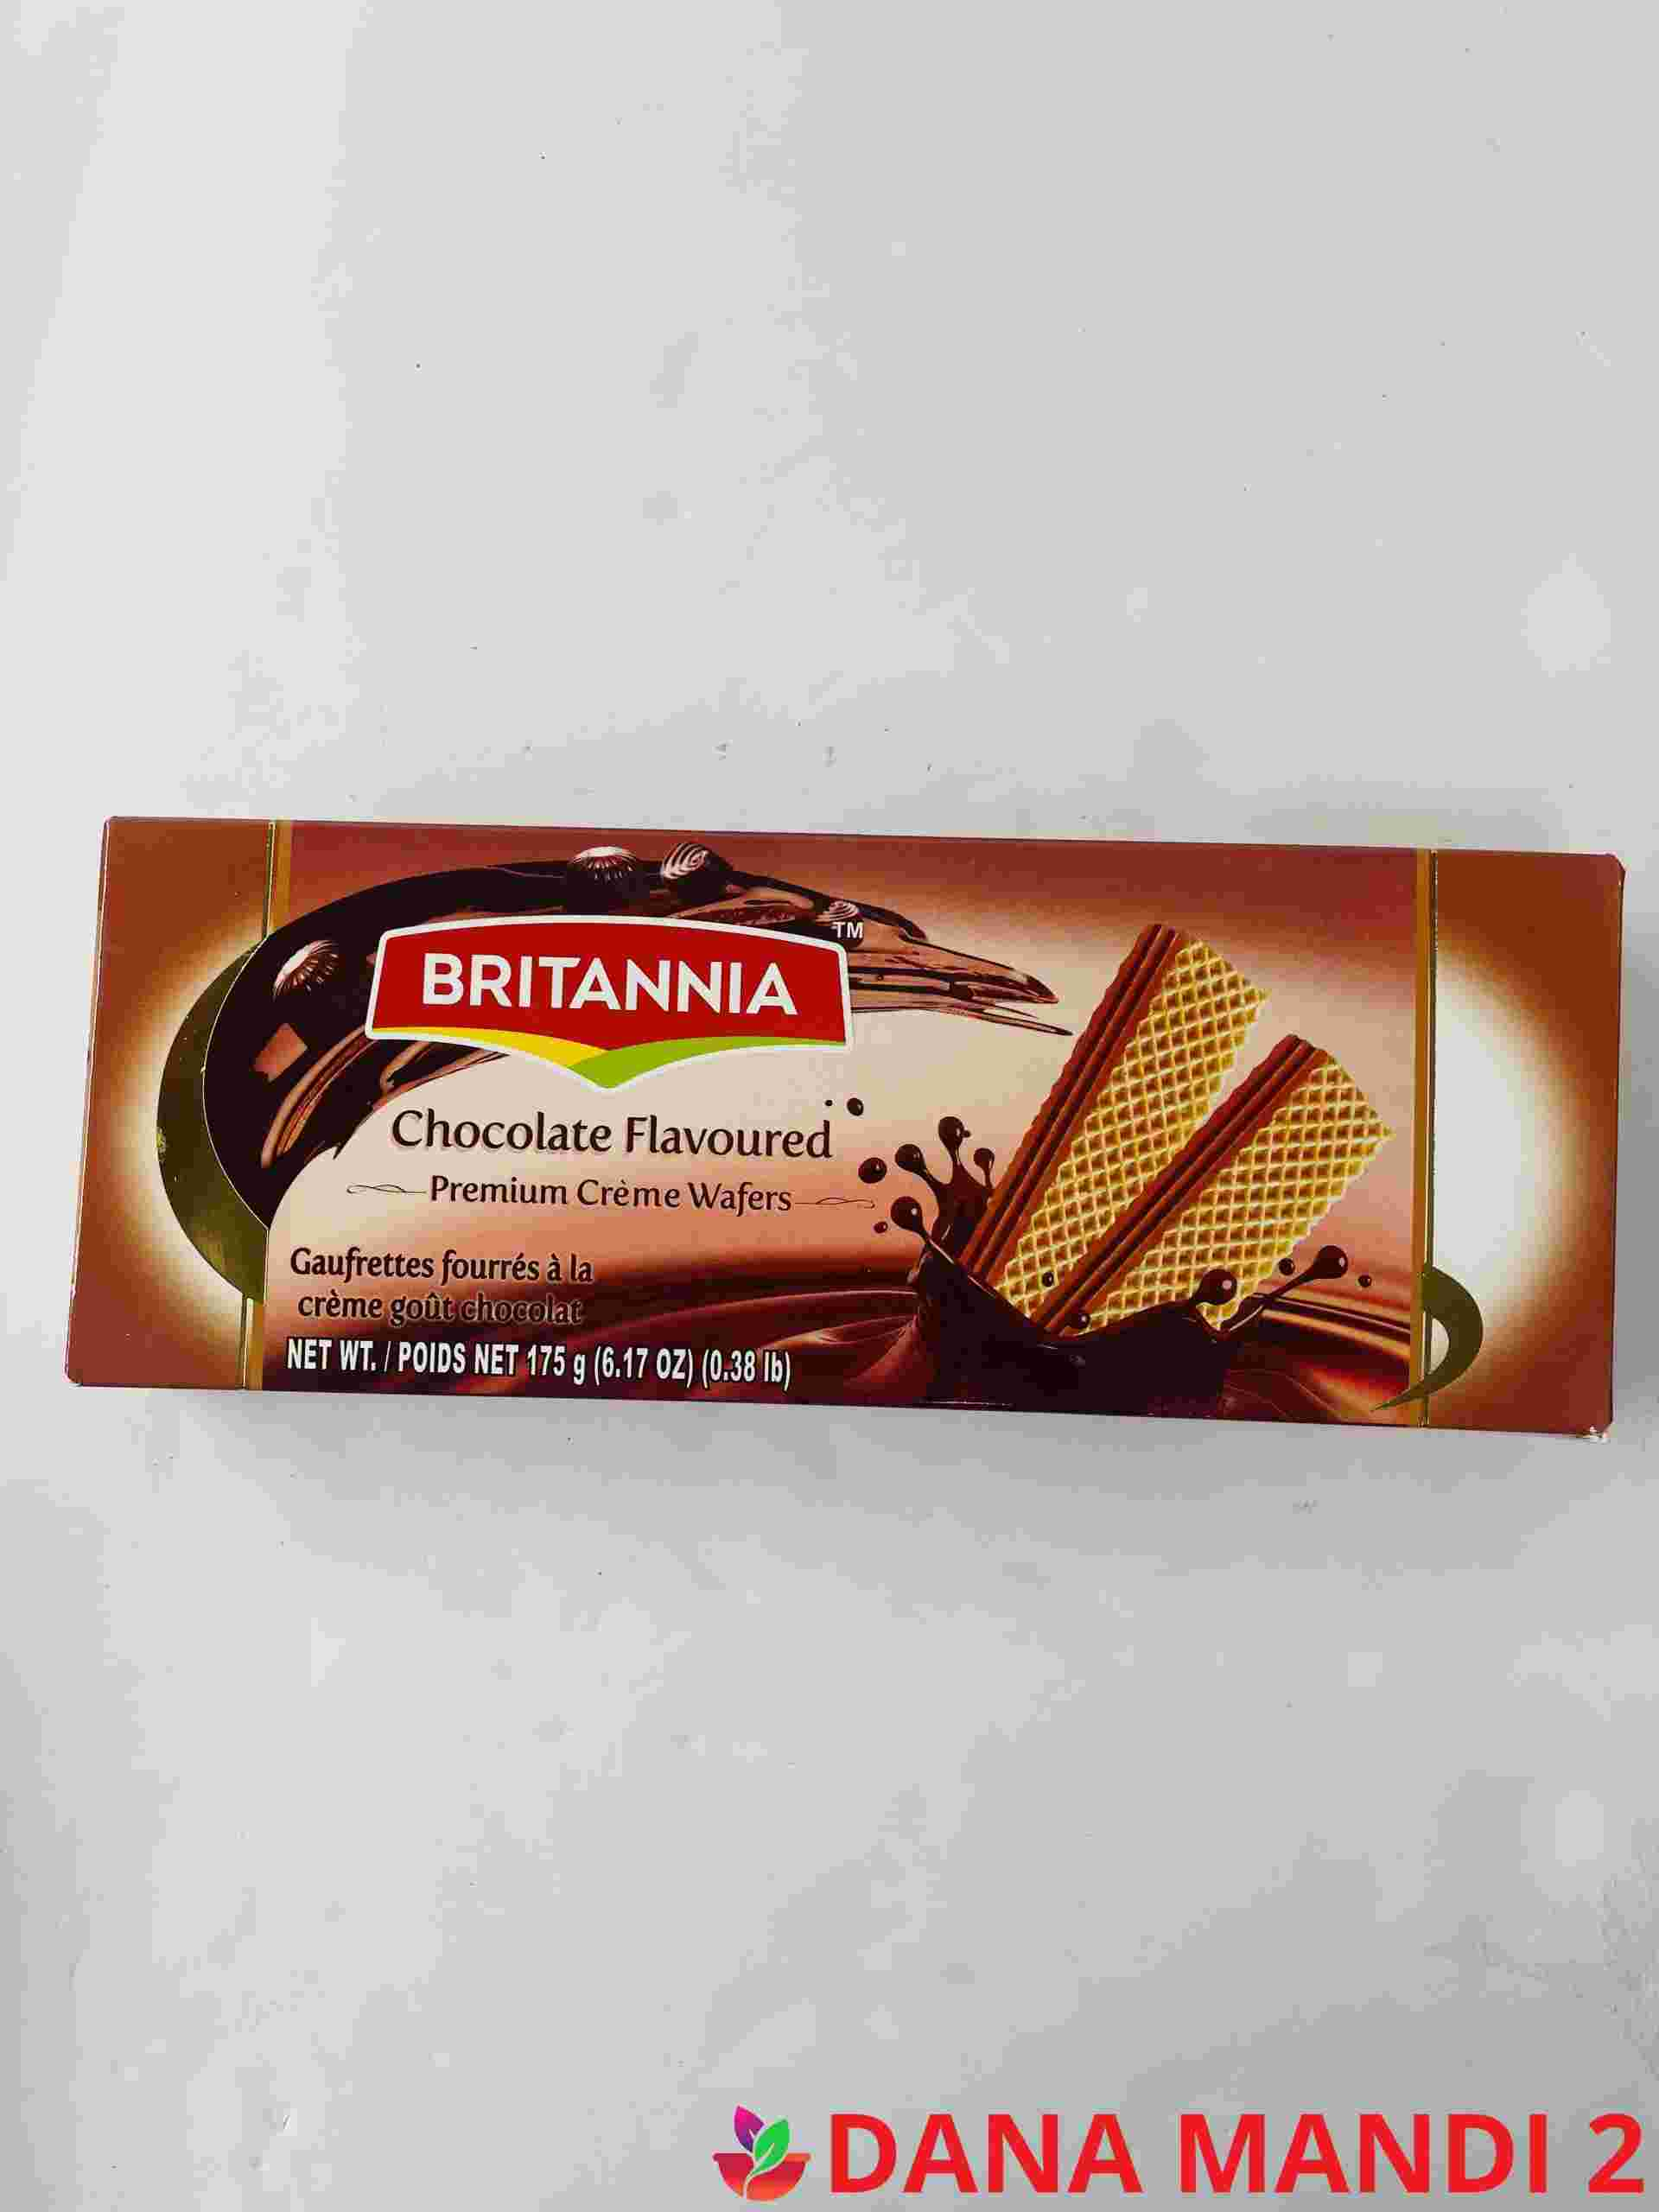 Britannia Chocolate Flavoured Wafers